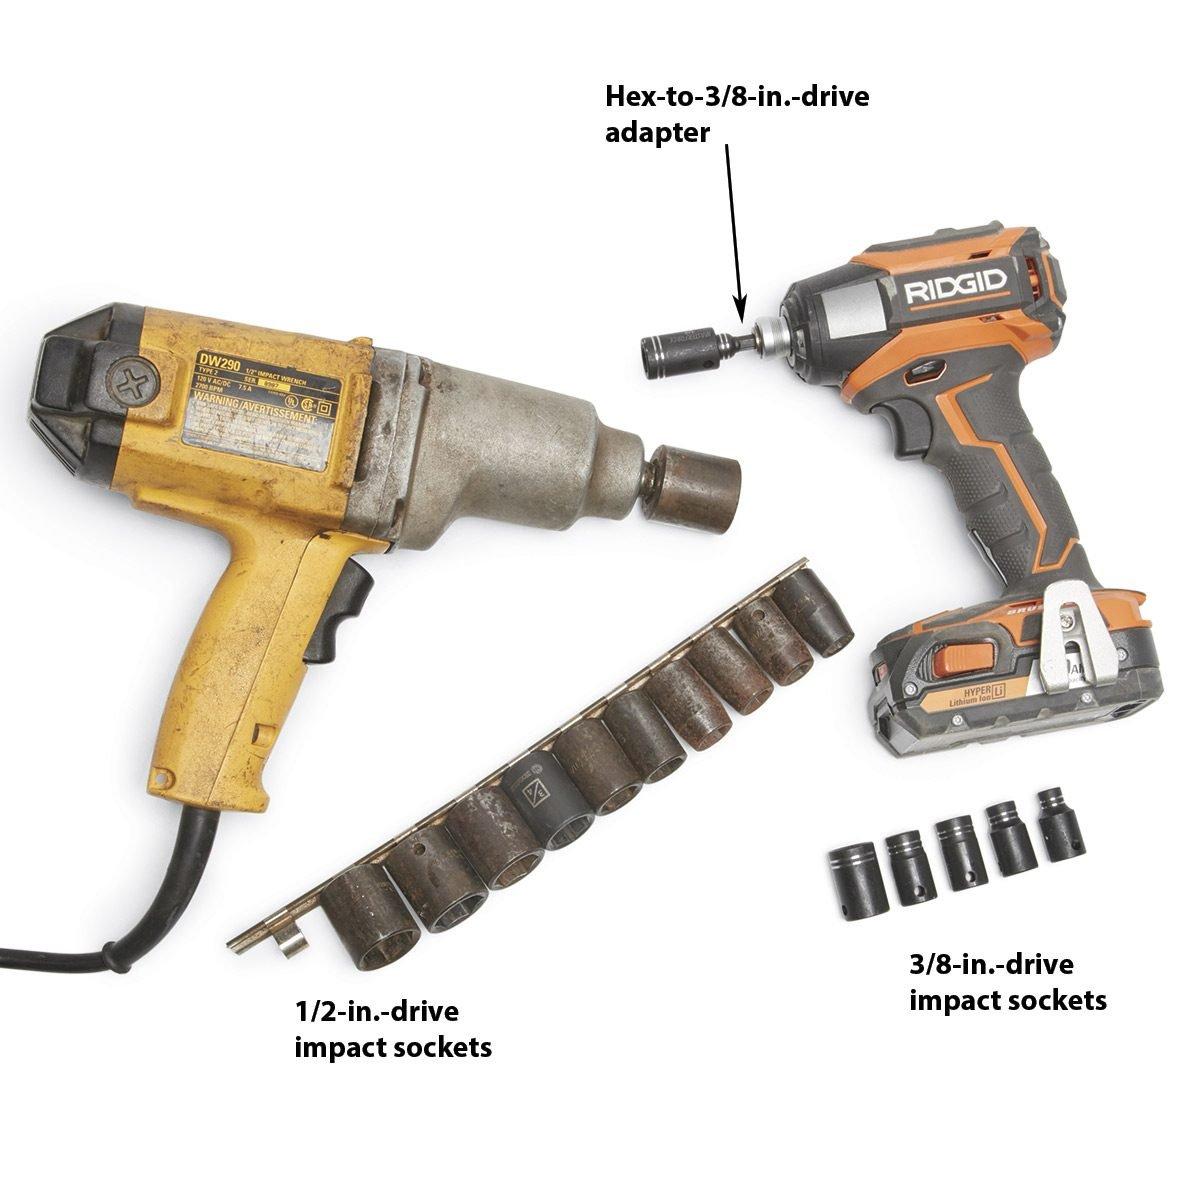 impact sockets and driver